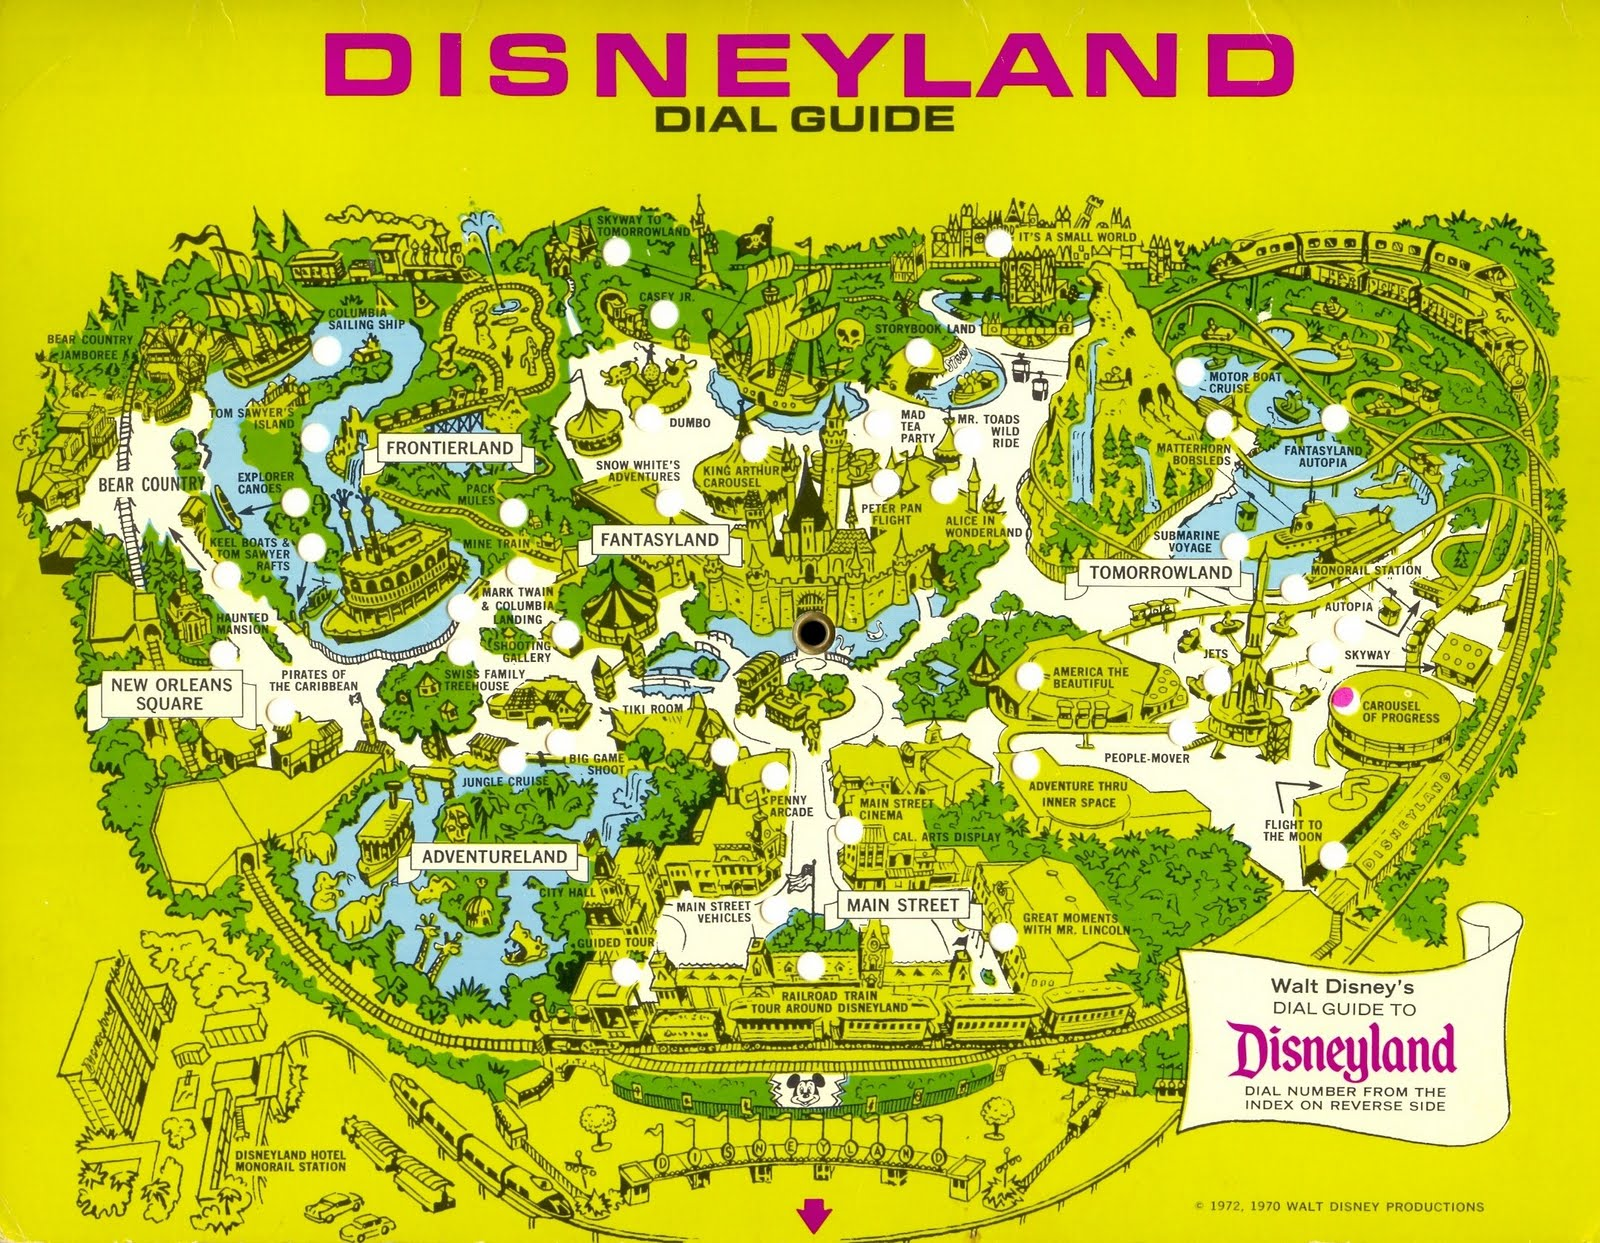 Disneyland 1972.jpg